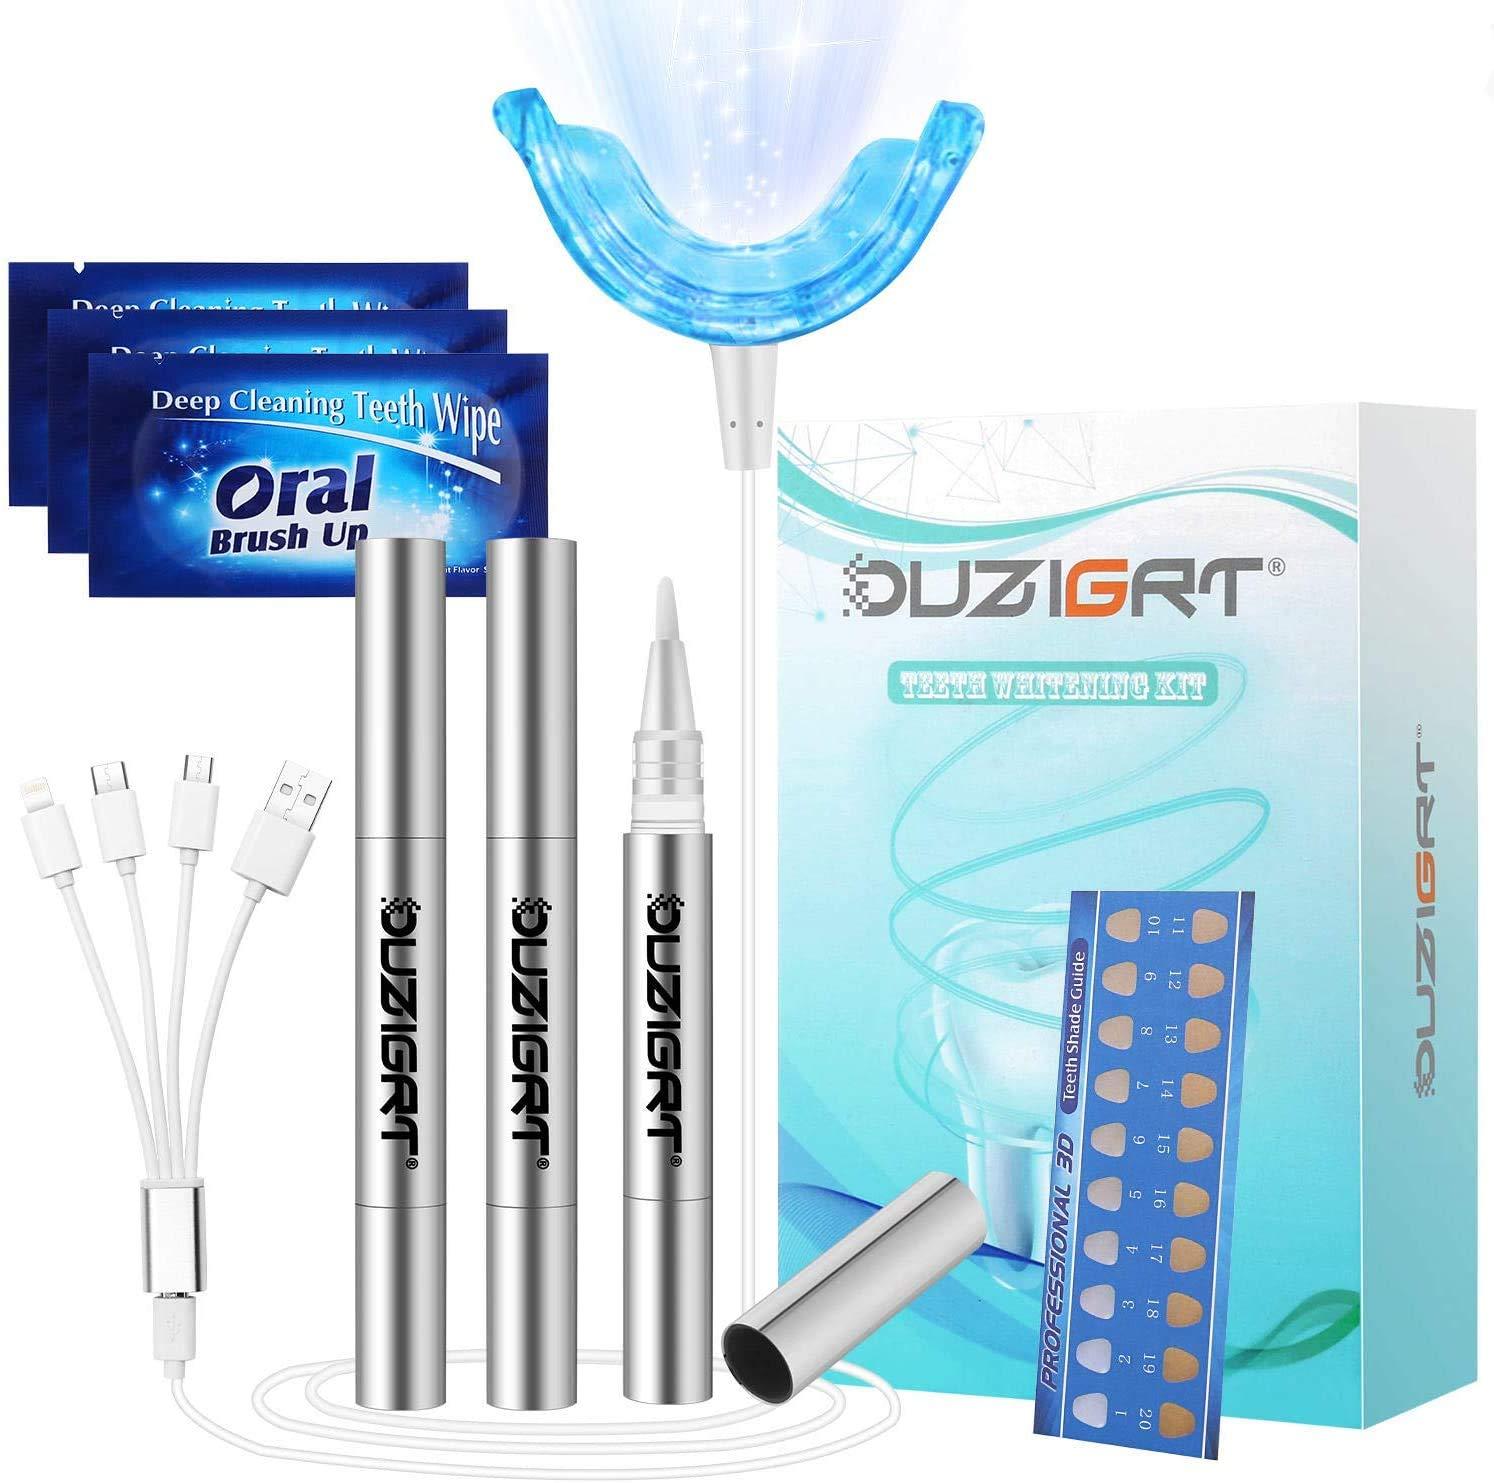 Teeth Whitening Kit Professional, OUZIGRT Teeth Whitening Kit with Led Light, 3 Teeth Whitening Pens, 15 Min Fast-Result Teeth Whitener, Non-Sensitive Teeth Whitening Kit at Home Travel Use